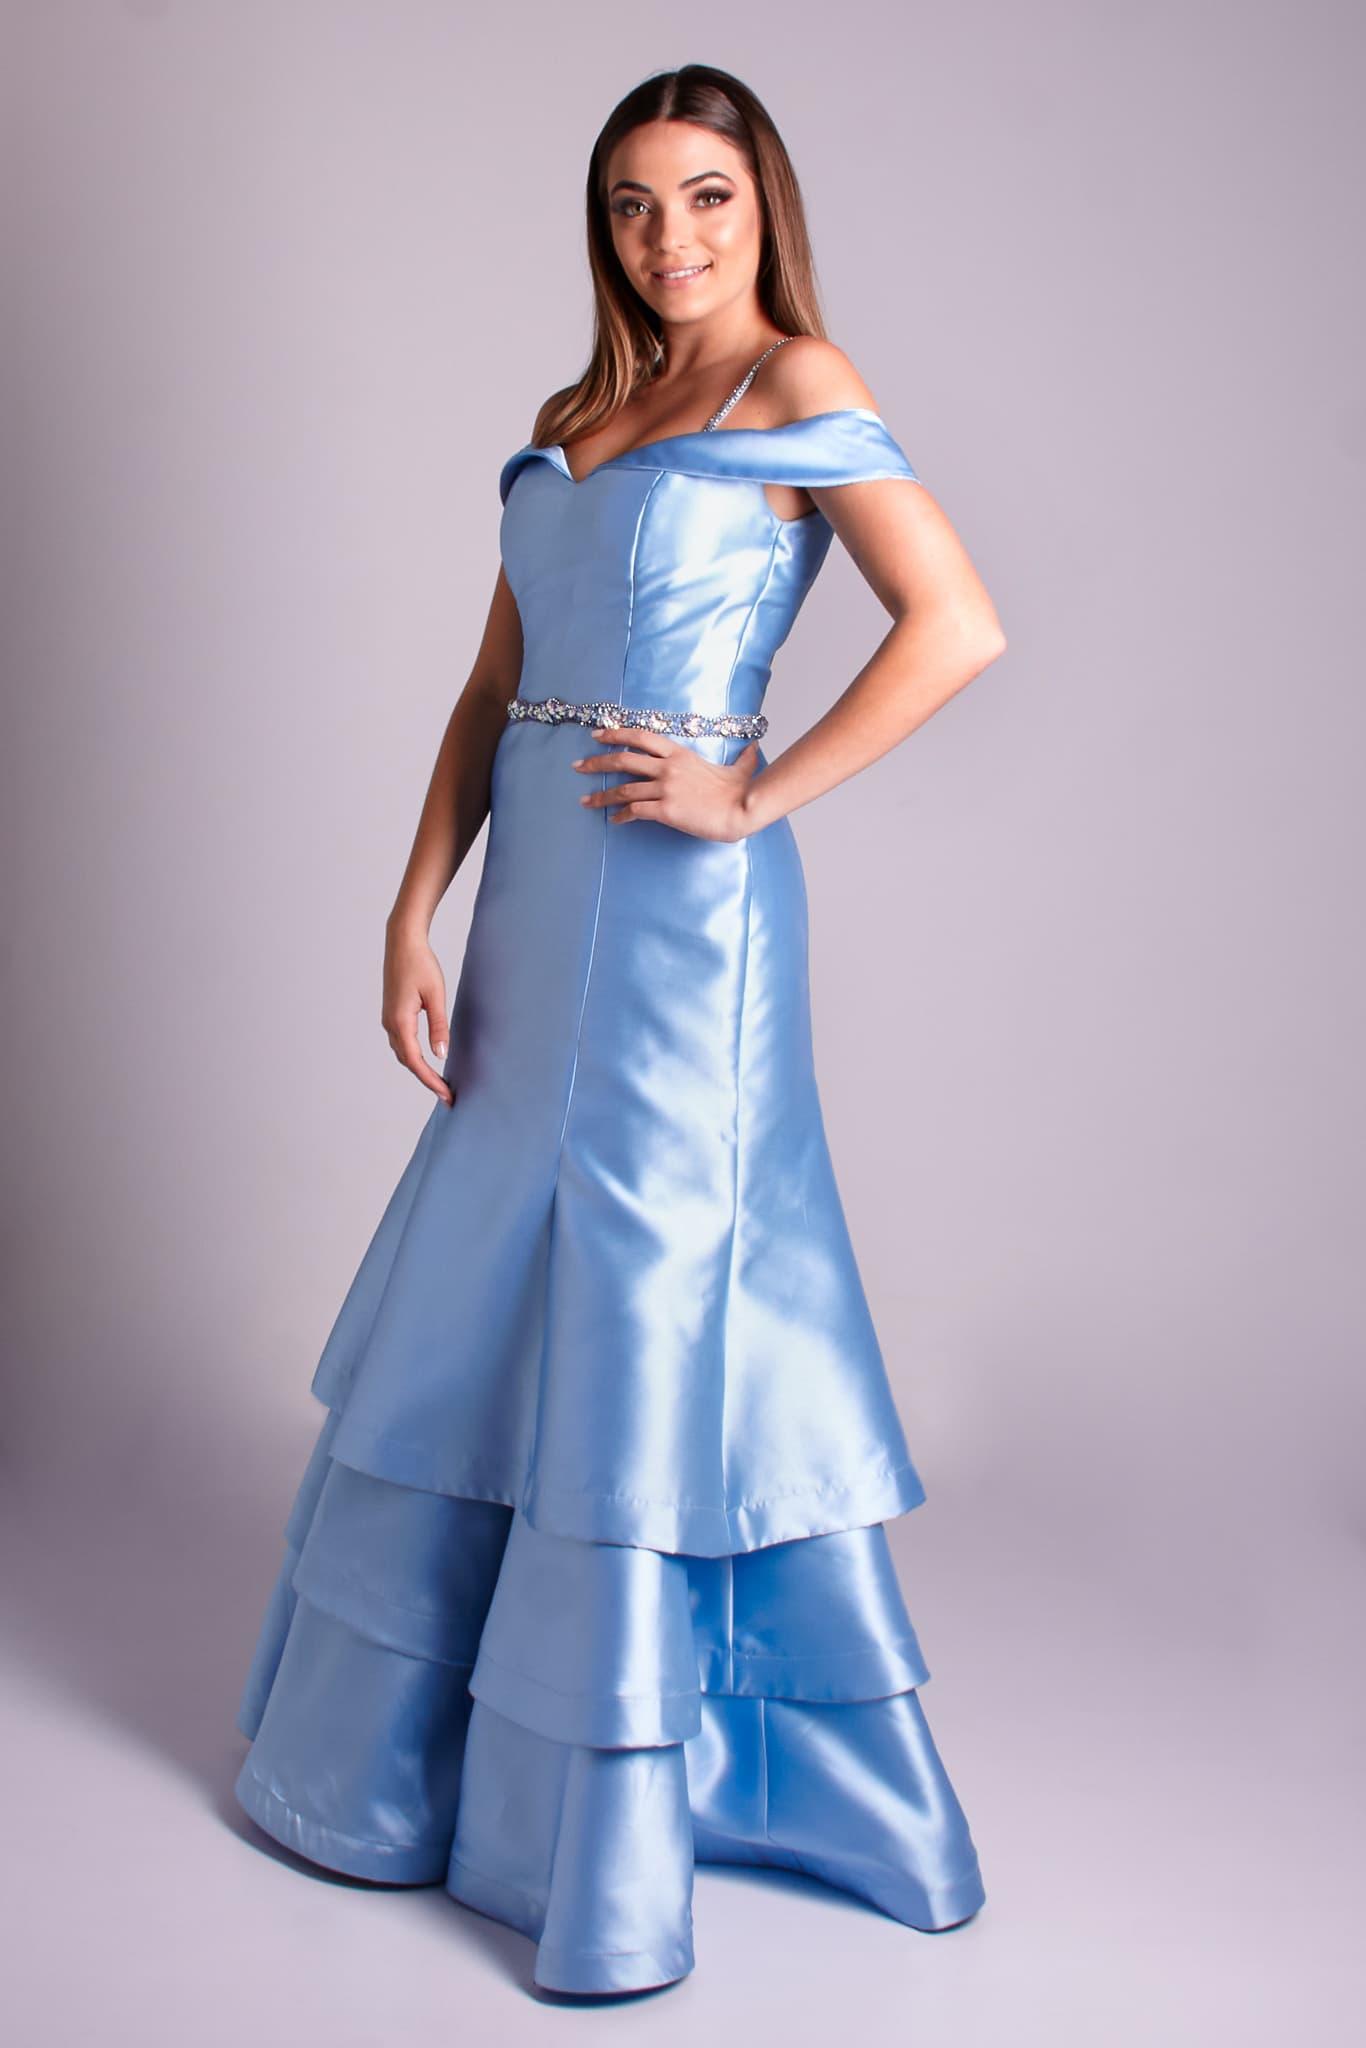 46 - vestido de zibeline azul serenity ombro a ombro